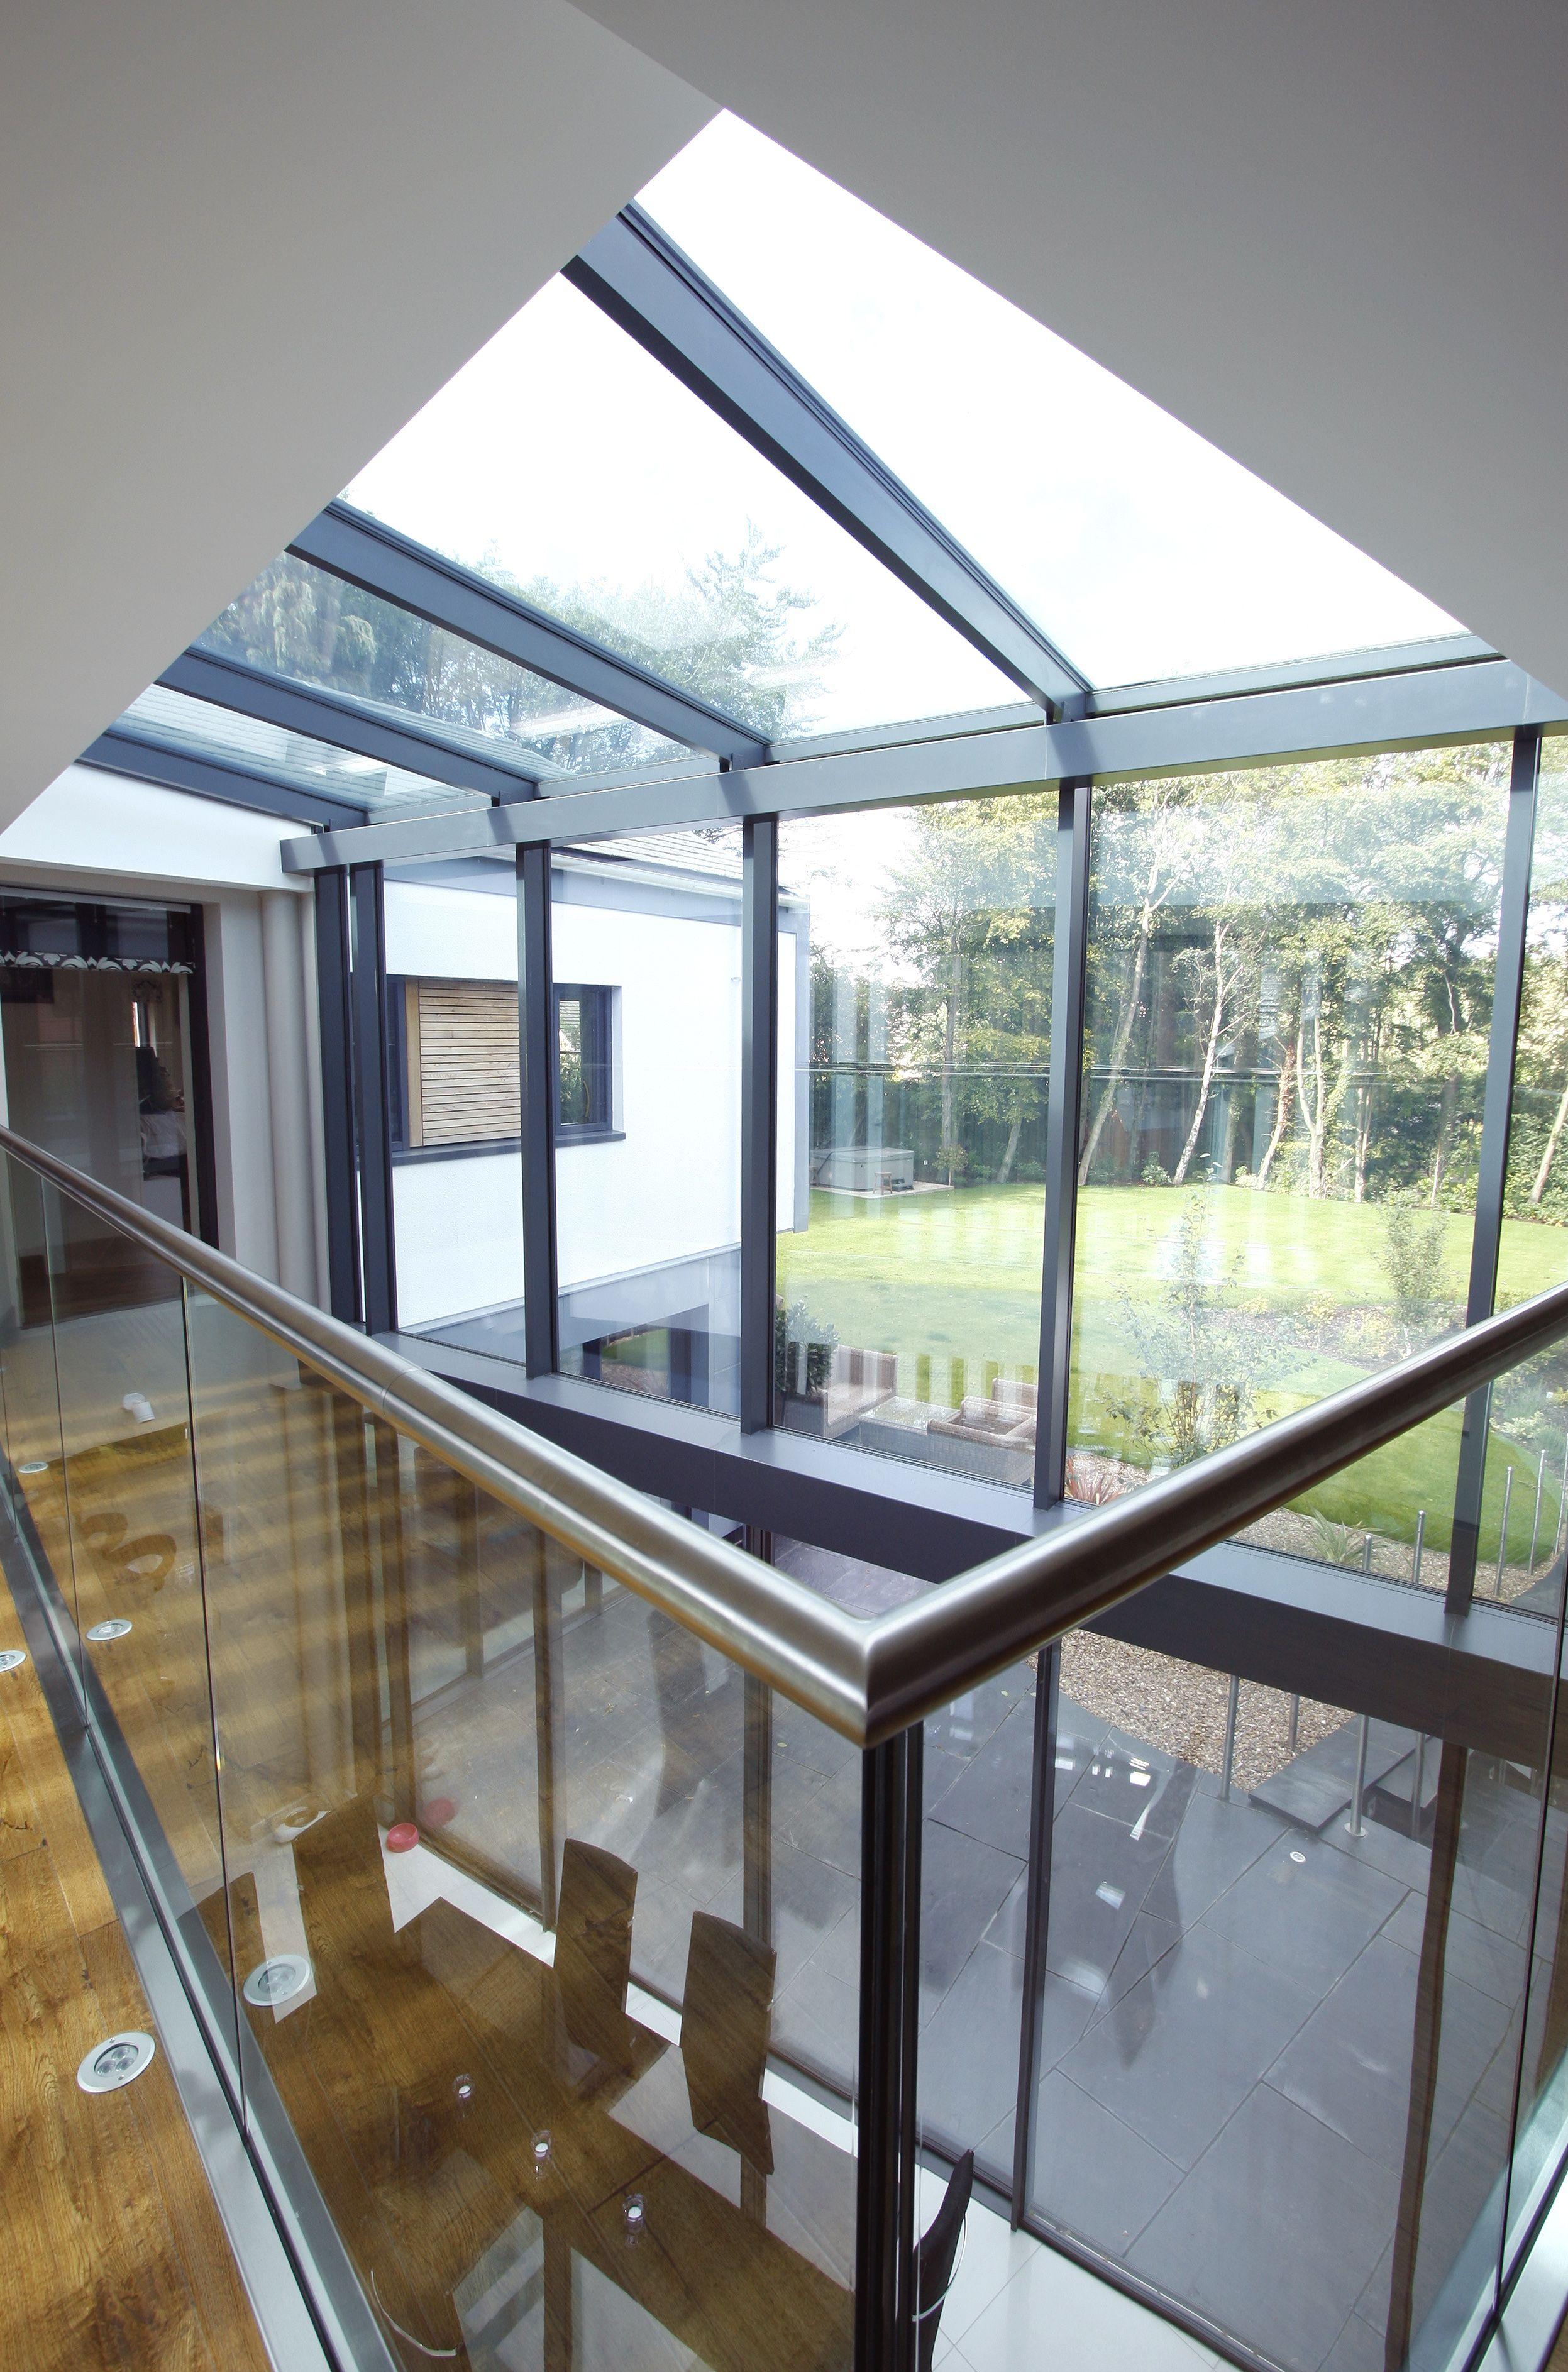 Double Glass House : Double story glass house